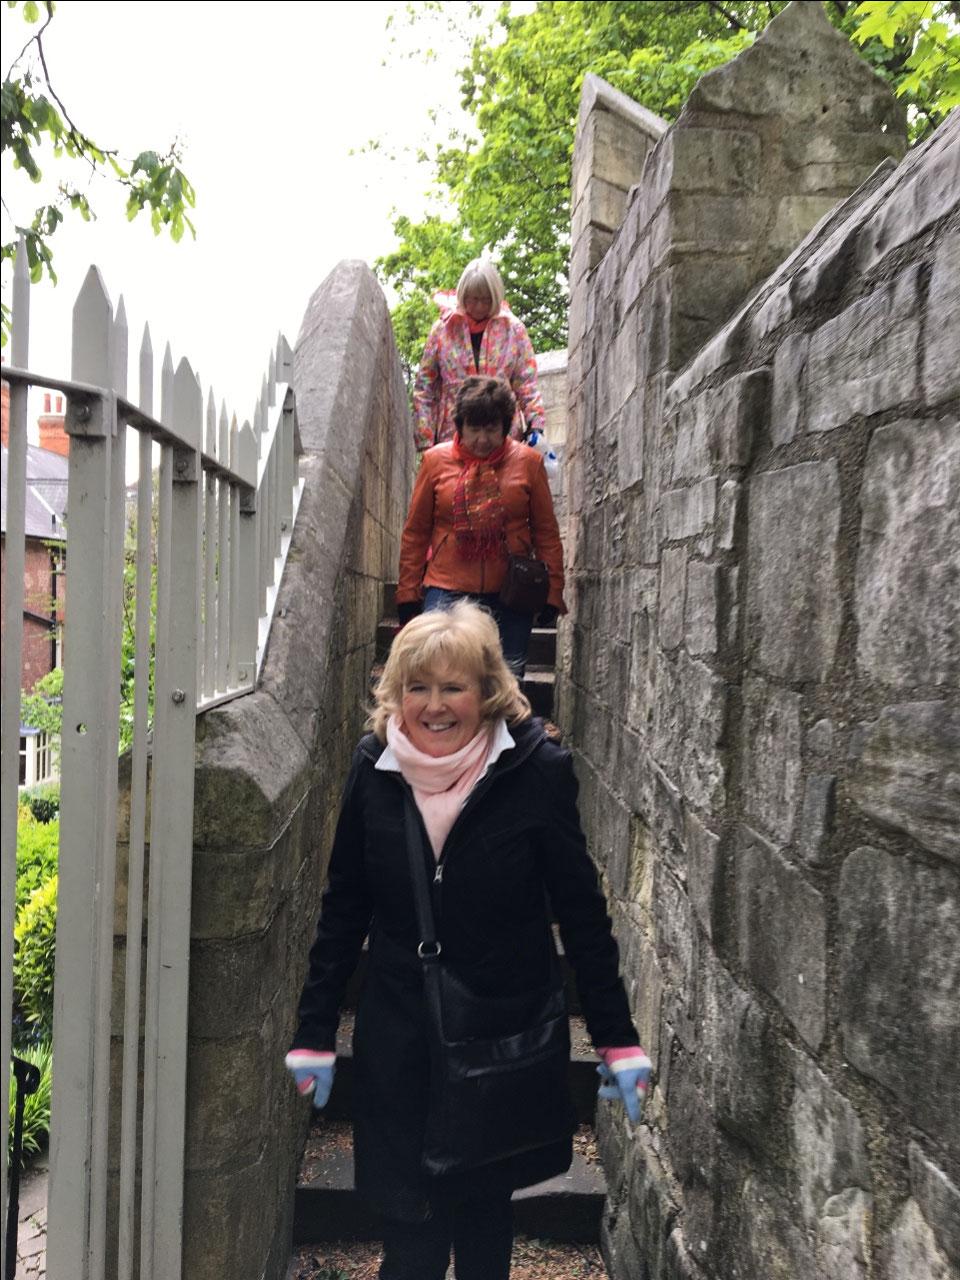 Walking the ancient walls of York